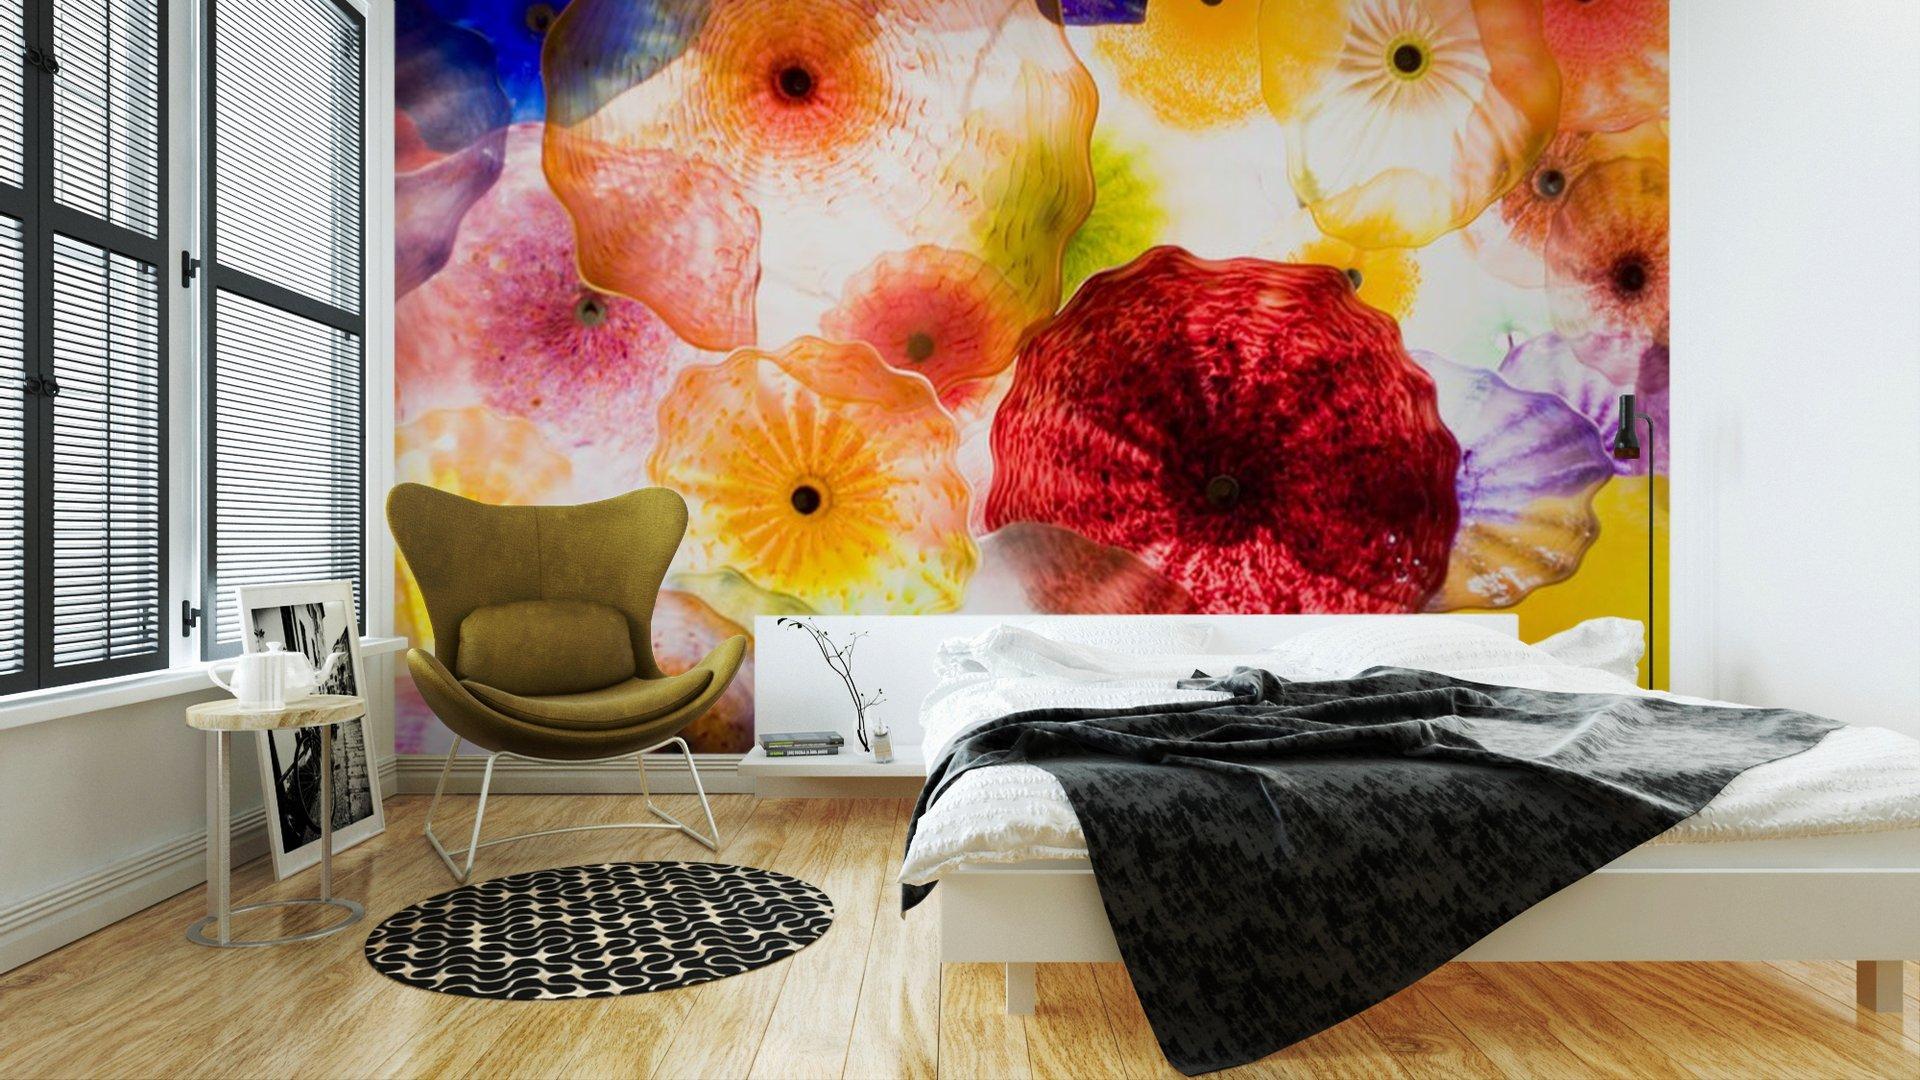 ARTE EN VIDRIO2 - Fotomural Tapiz Patrón Floral 01